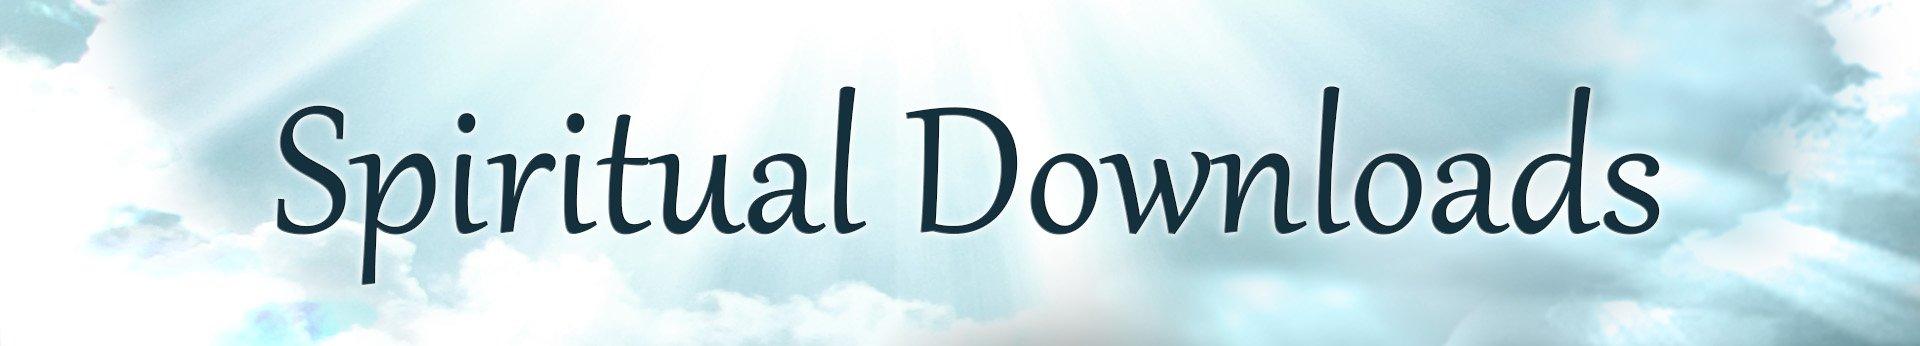 Spiritual Downloads